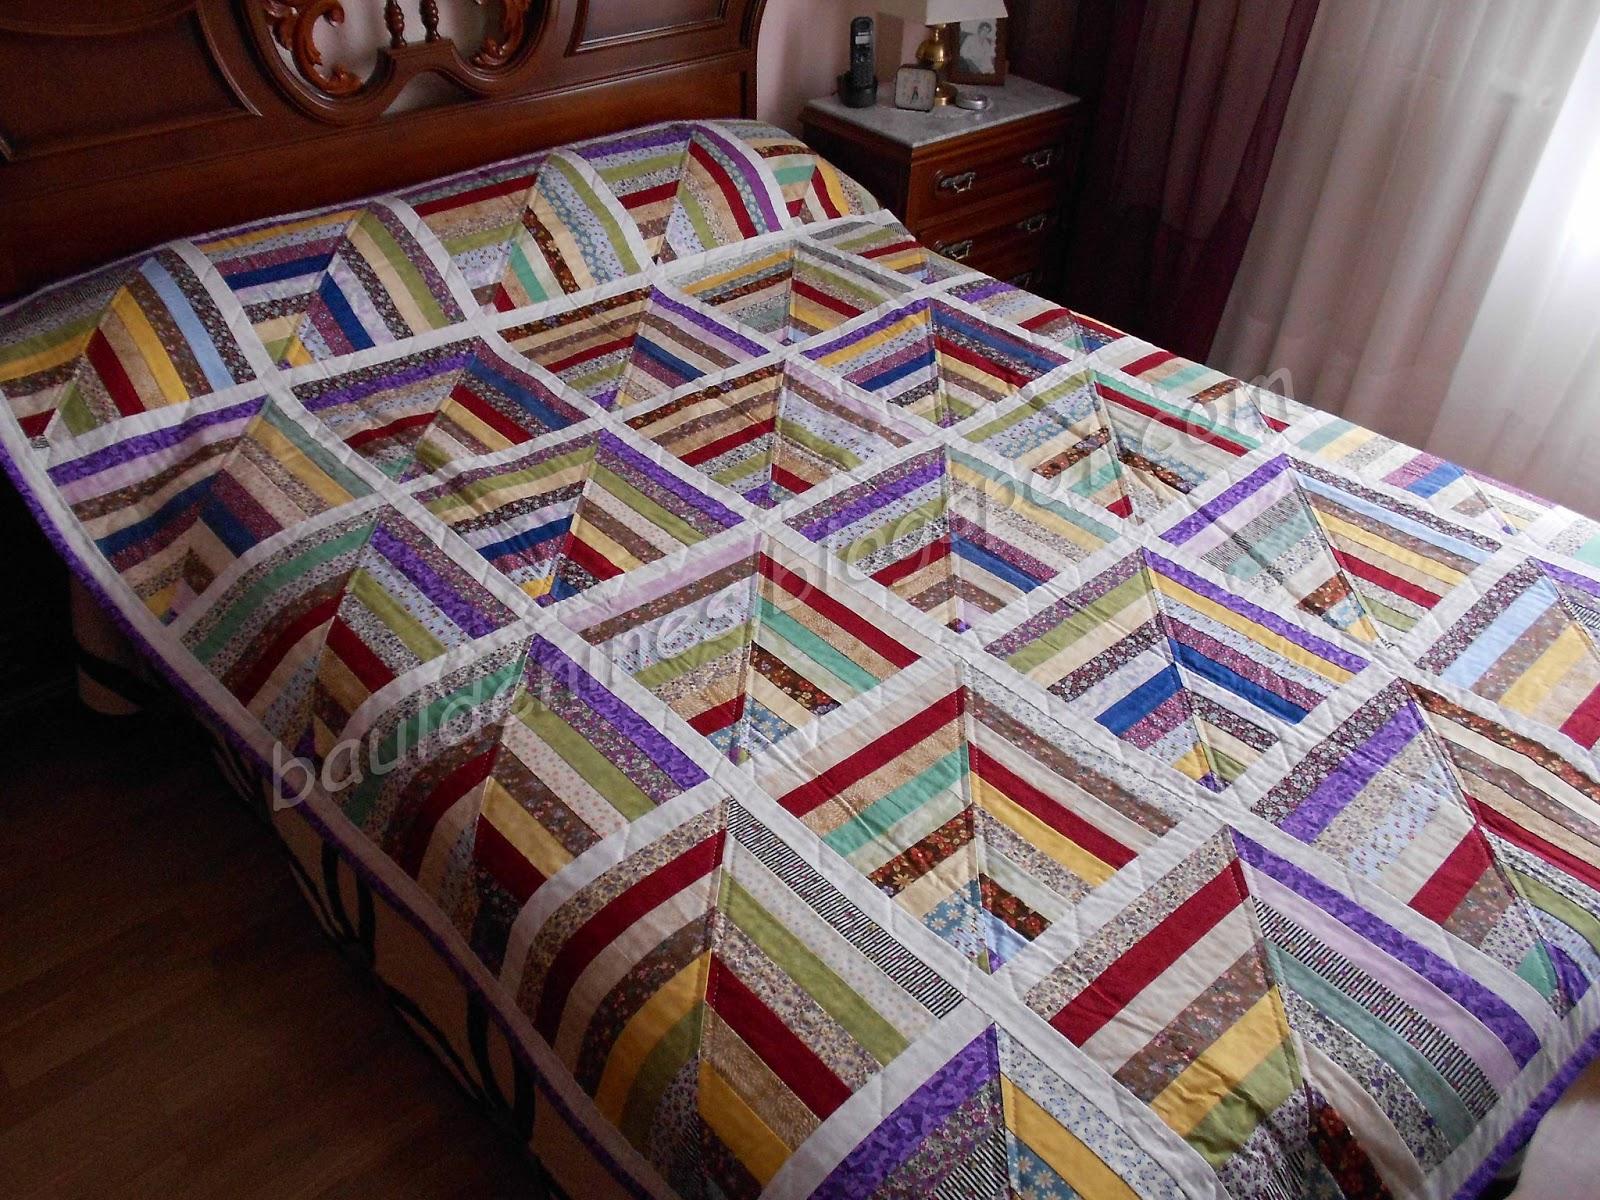 Ba l de nines patchwork colcha tiras patchwork - Colchas de patchwork hechas a mano ...